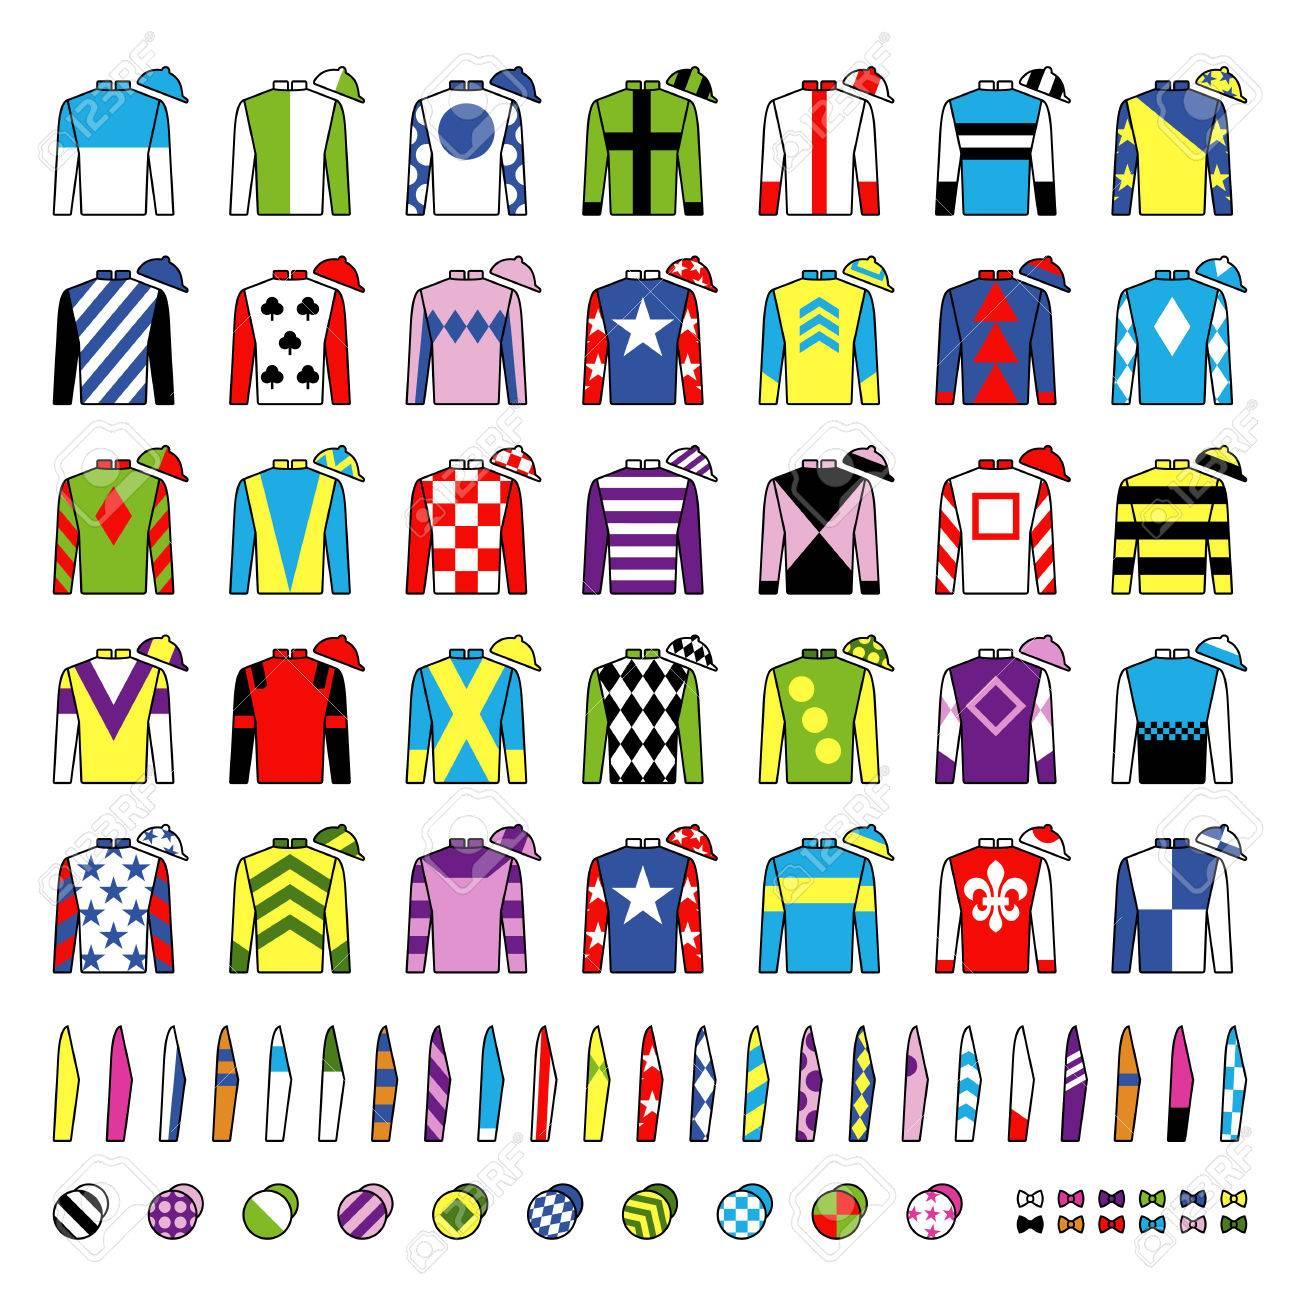 Jockey Uniform Traditional Design Jackets Silks Sleeves And Royalty Free Cliparts Vectors And Stock Illustration Image 82732560